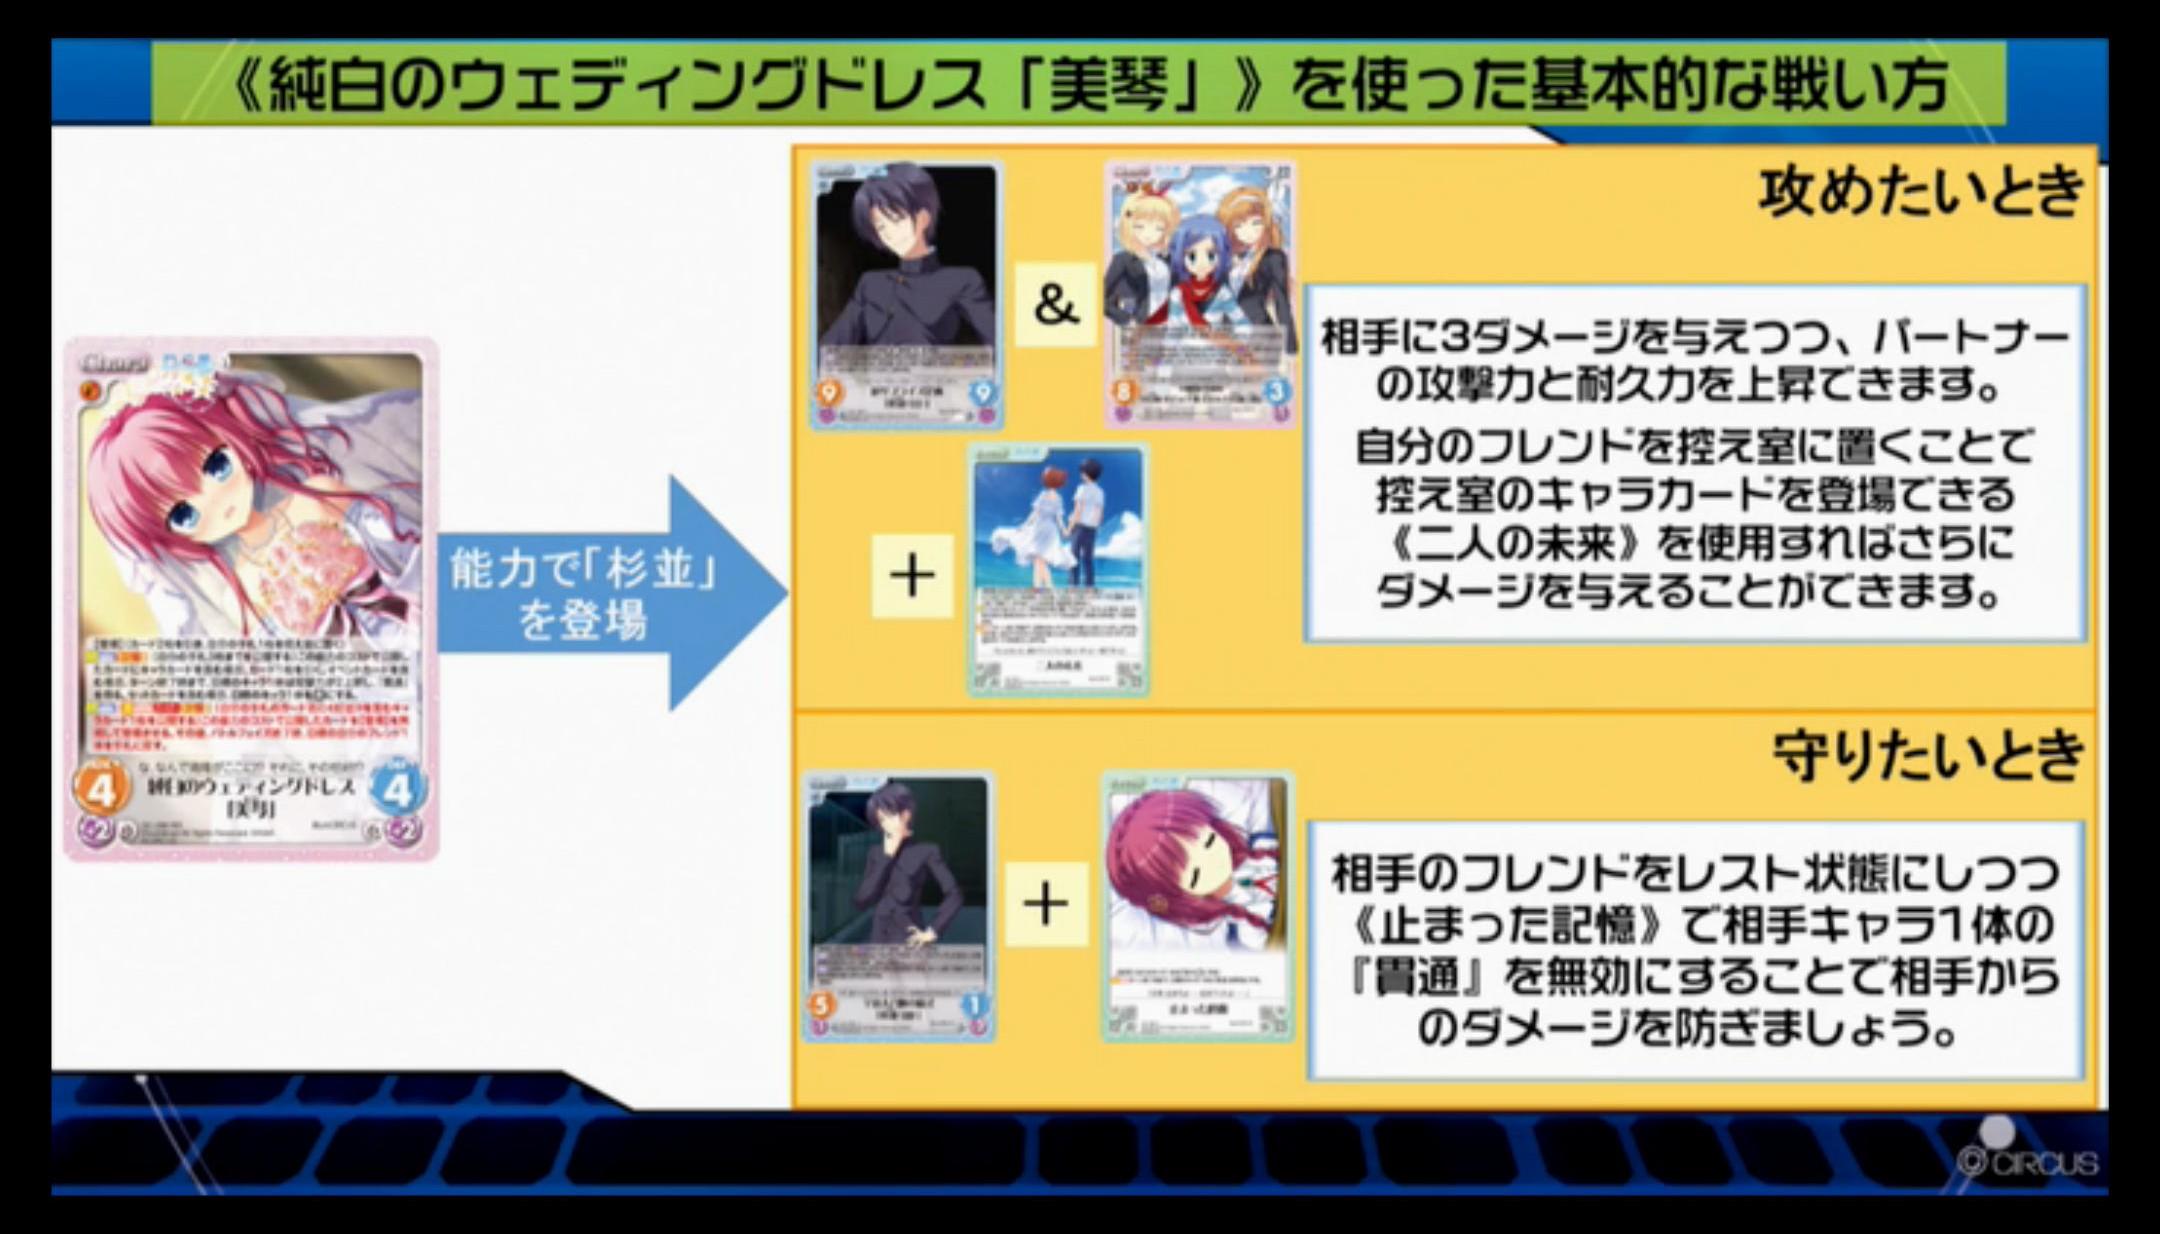 dbeb43901d933 Chaos 「千の刃濤、桃花染の皇姫」が参戦決定!「アホガール」新規 ...